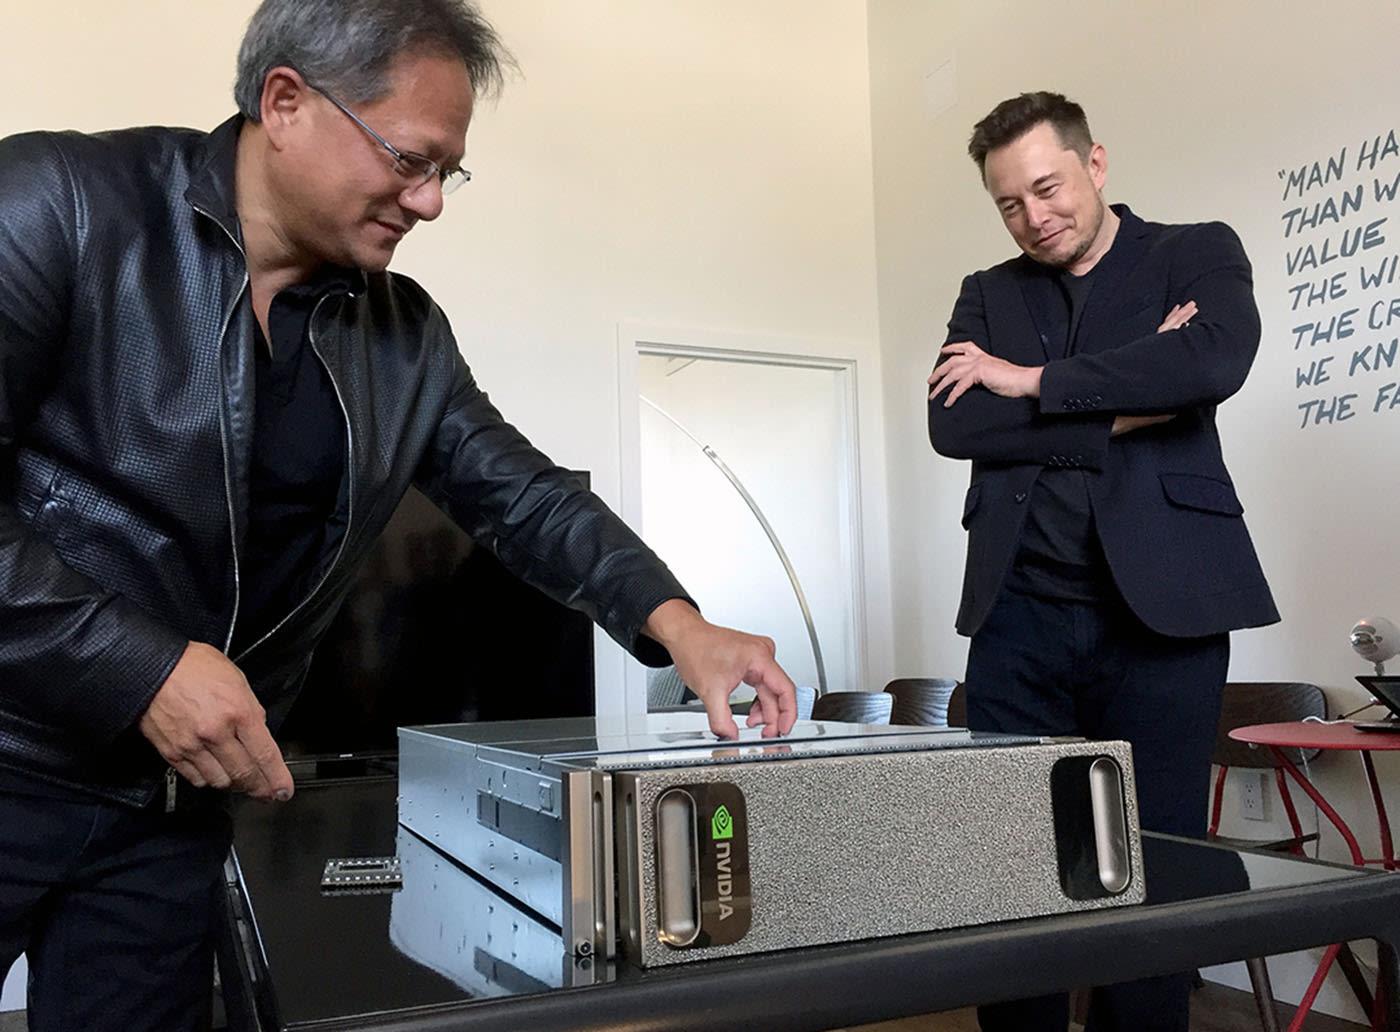 Jen-Hsun Huang with Elon Musk, and the DGX-1. NVIDIA.